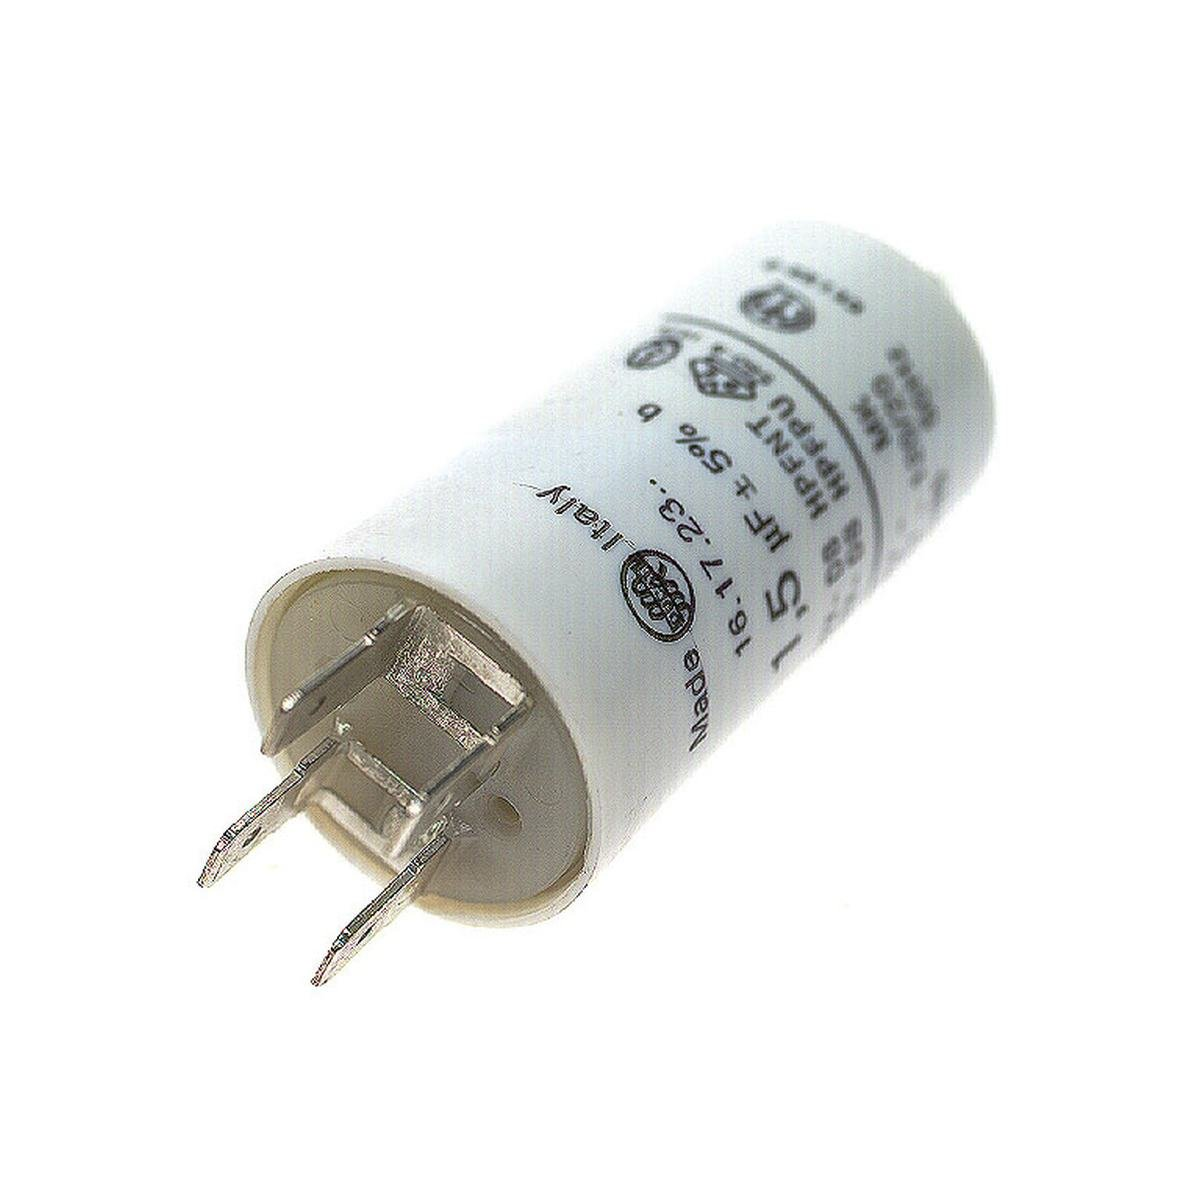 Kondensator 25,0 µF 450V